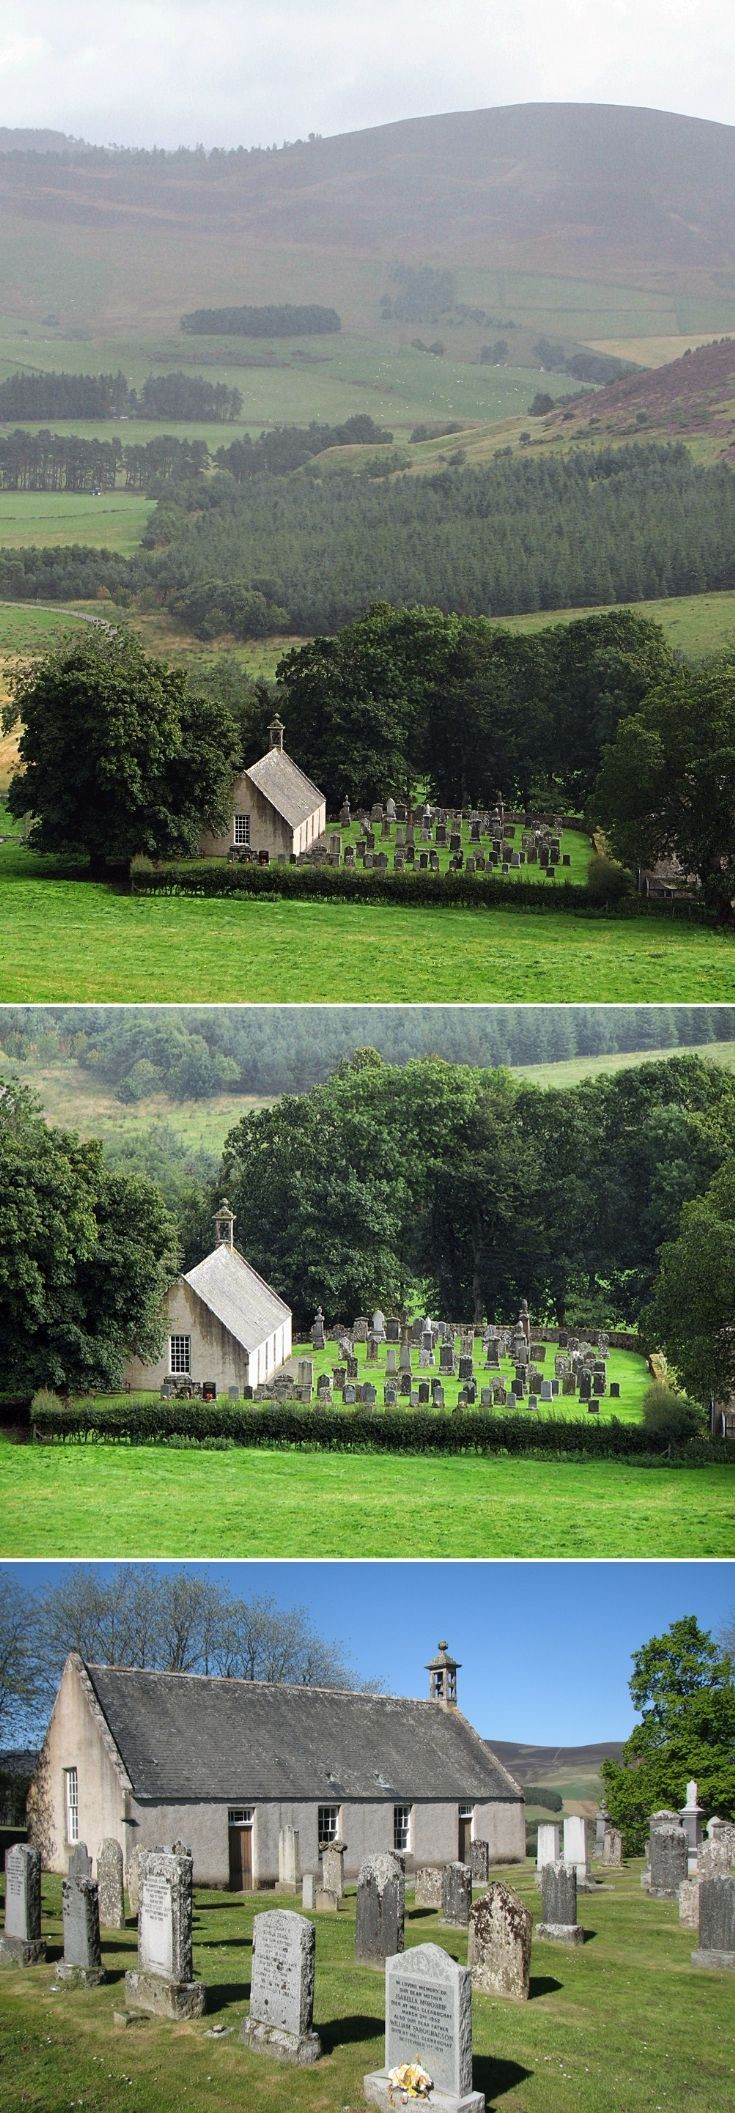 2 Glenbuchat Kirk and Graveyard